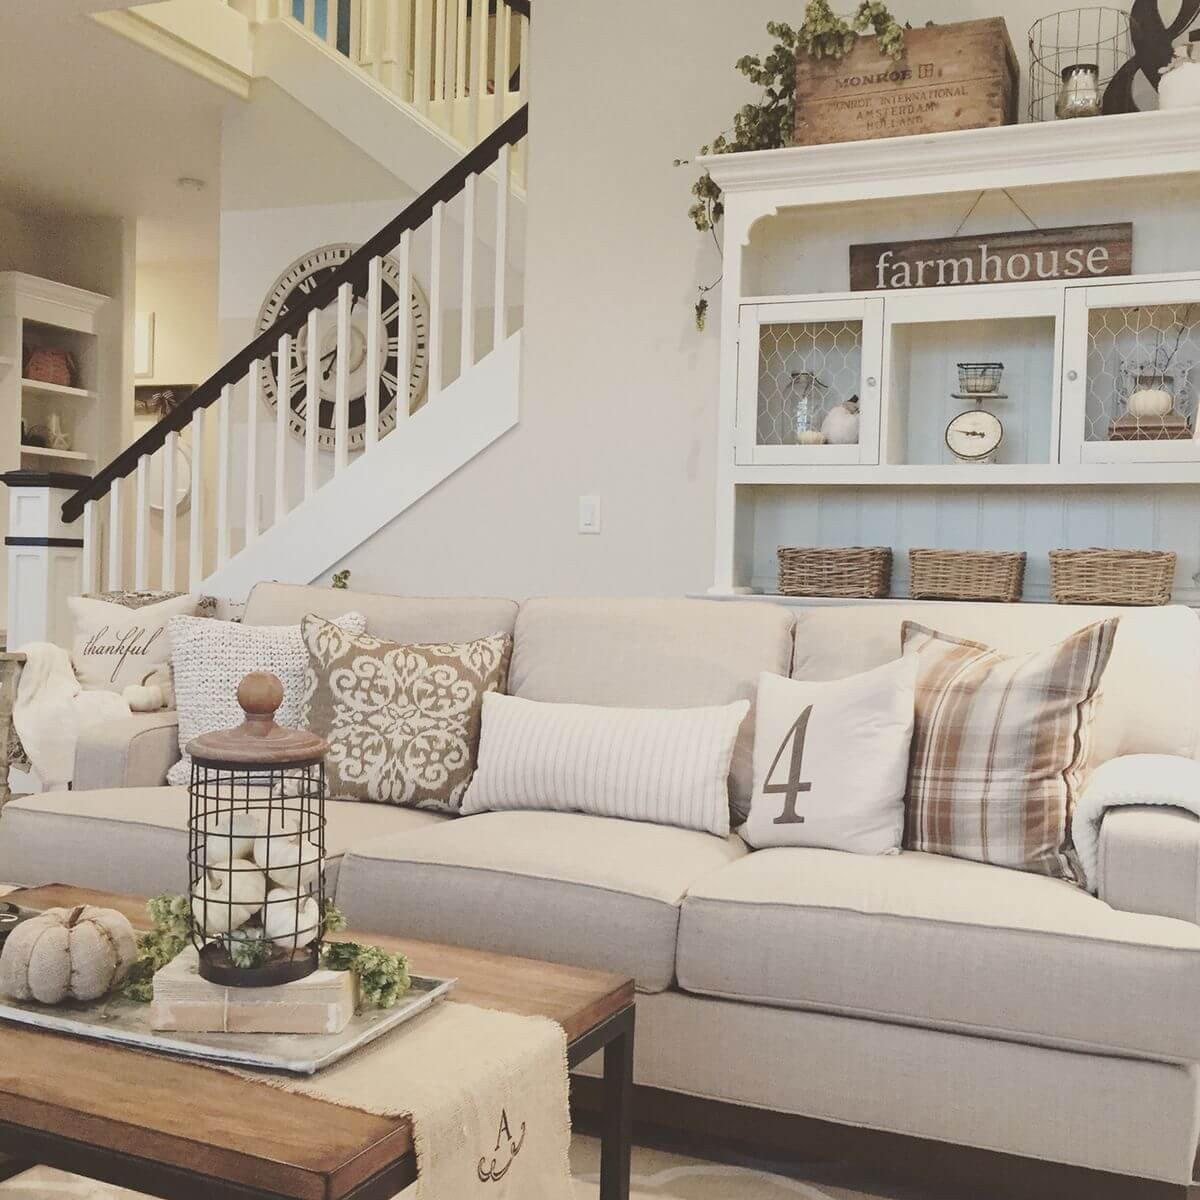 Small Farmhouse Living Room Ideas Lovely 35 Best Farmhouse Living Room Decor Ideas and Designs for 2017